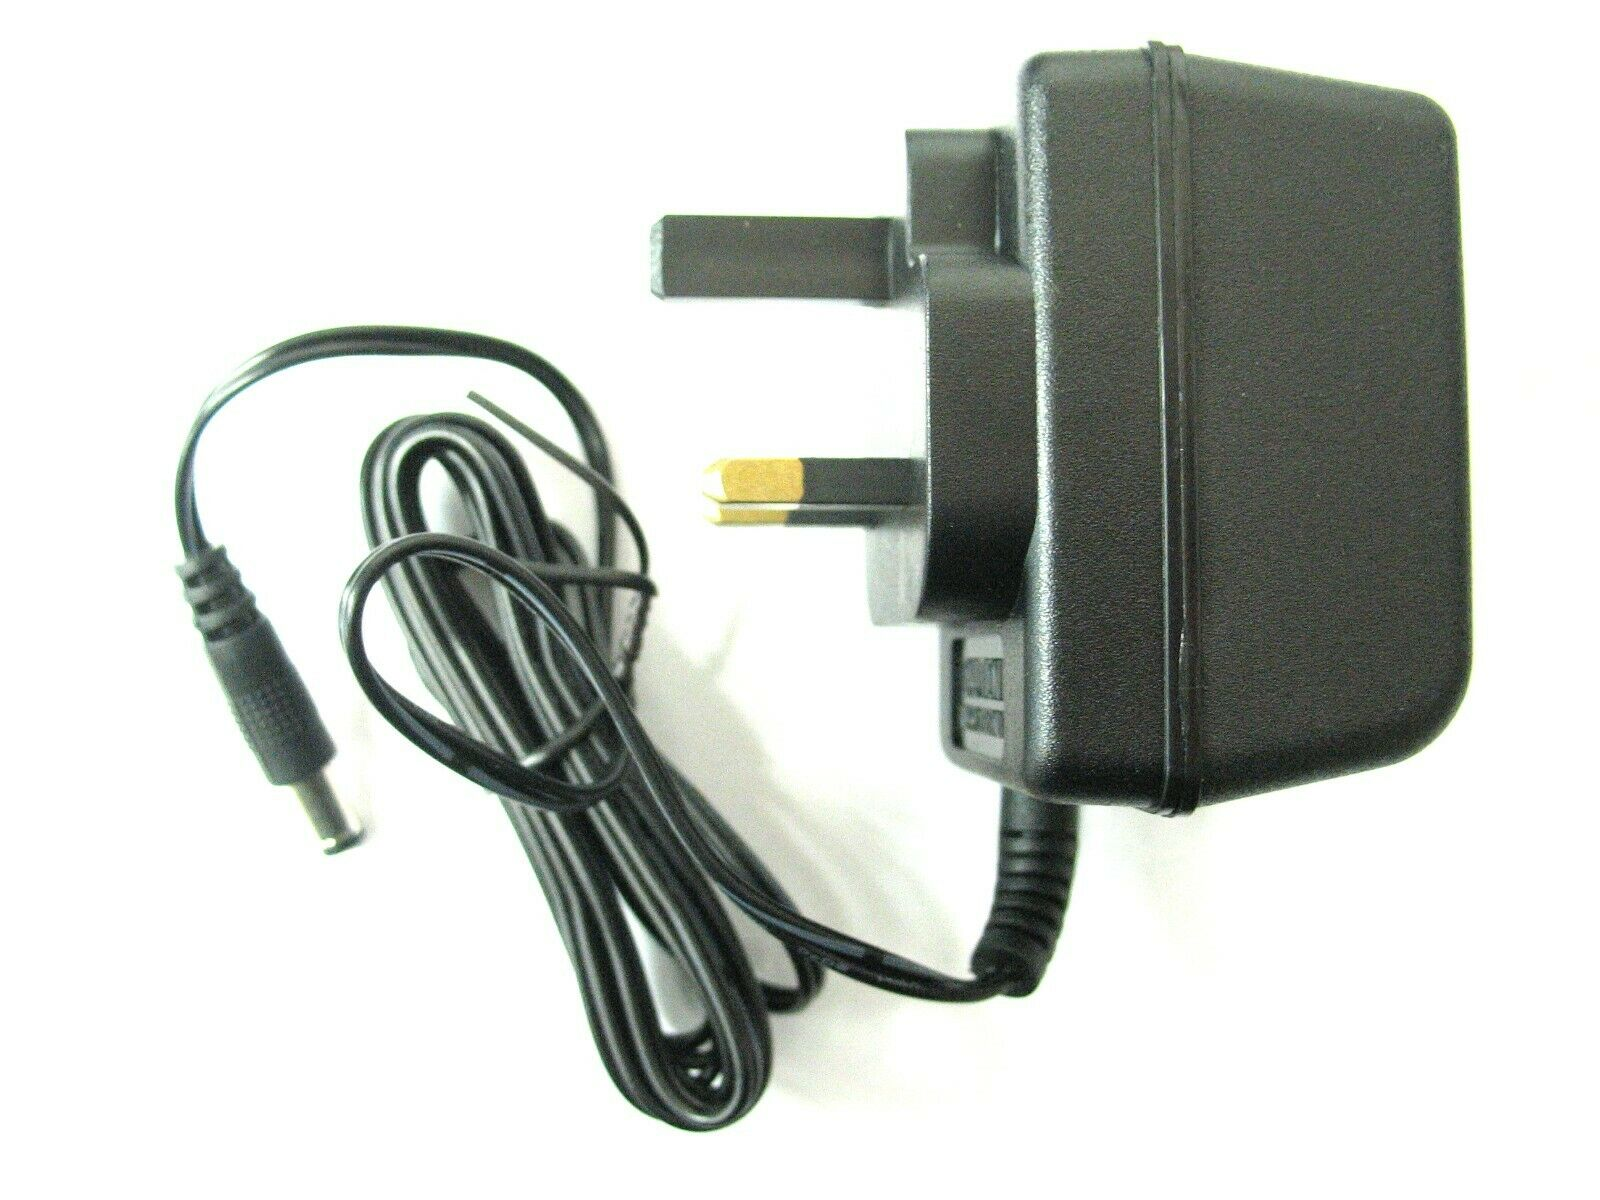 1 amp 12 volt AC-AC (AC Output) Mains Power Adaptor/Supply/Charger (12 watt)